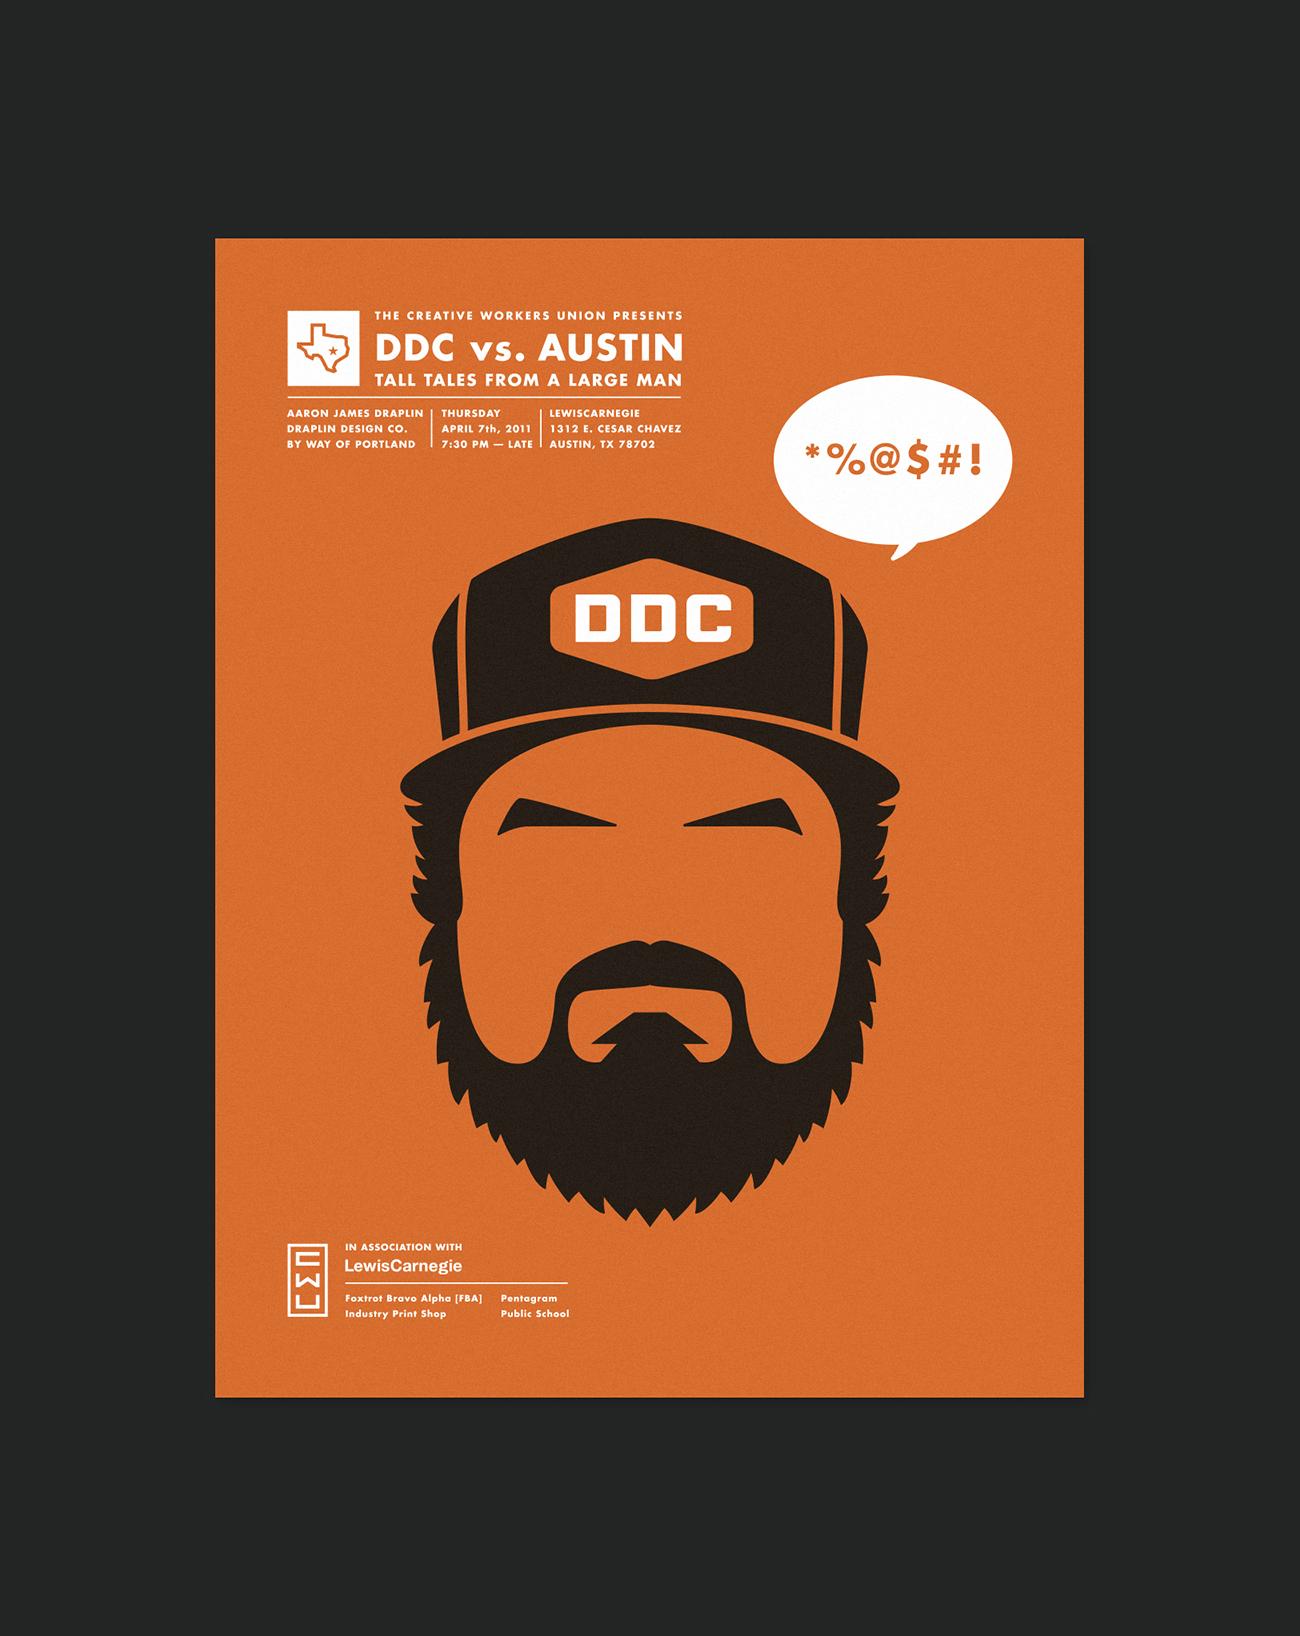 joshua_kramer_ddc_vs_aus_3_poster_Small